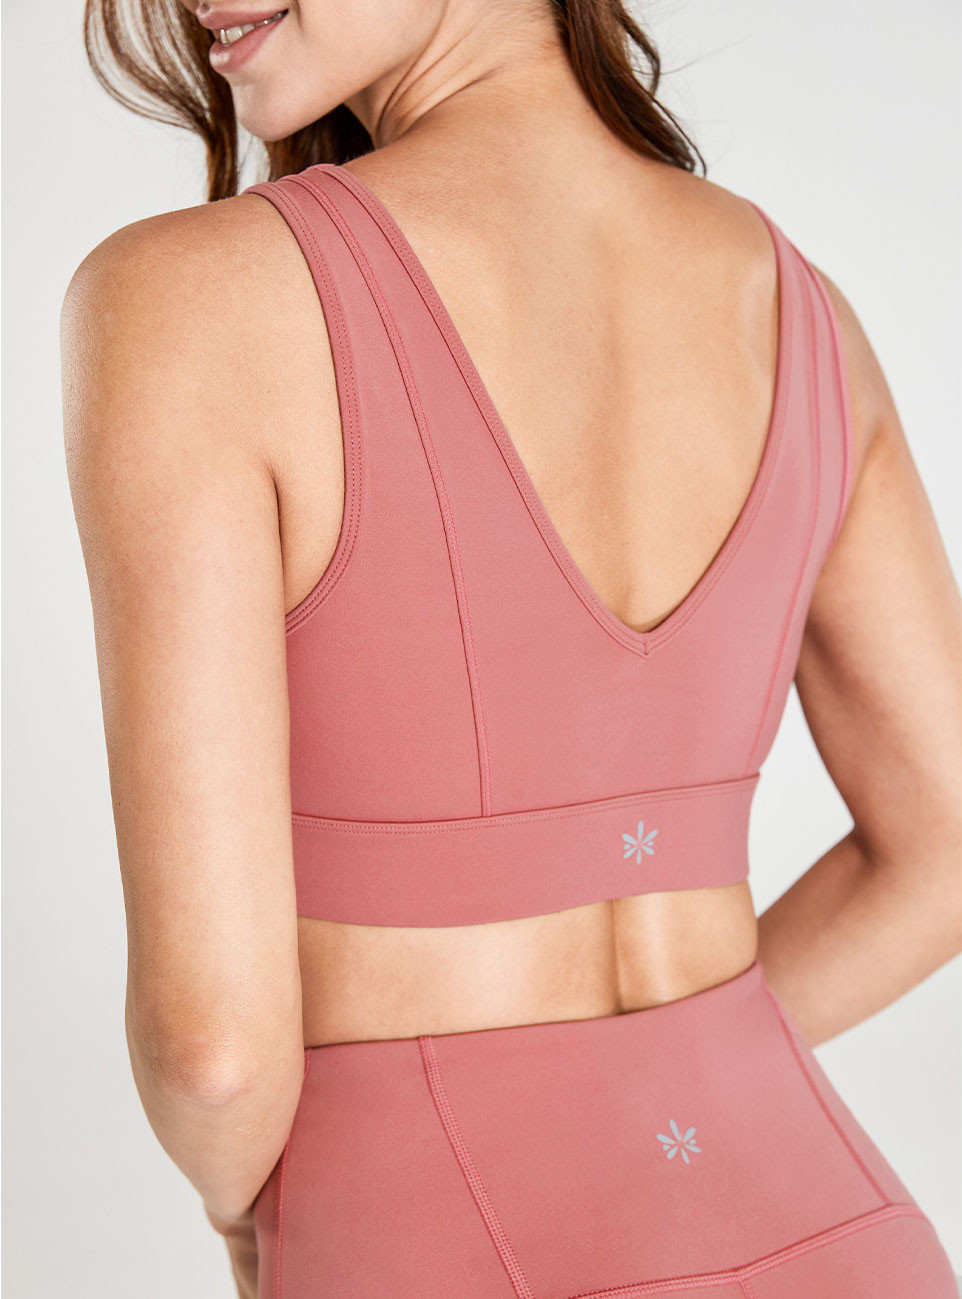 Peach Pink Activewear Manufacturer